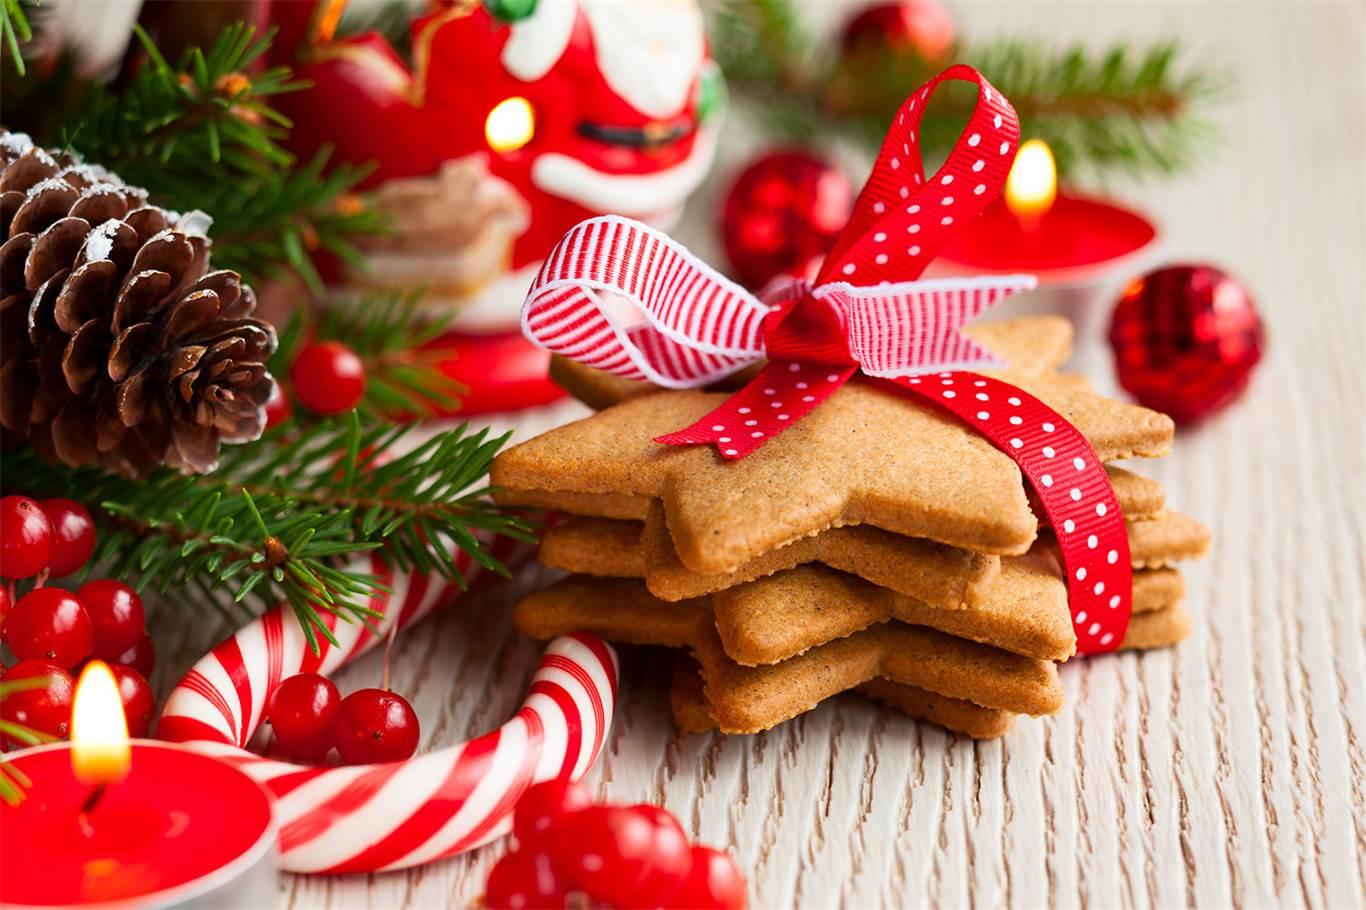 Christmas Holidays Pictures.Christmas Holidays